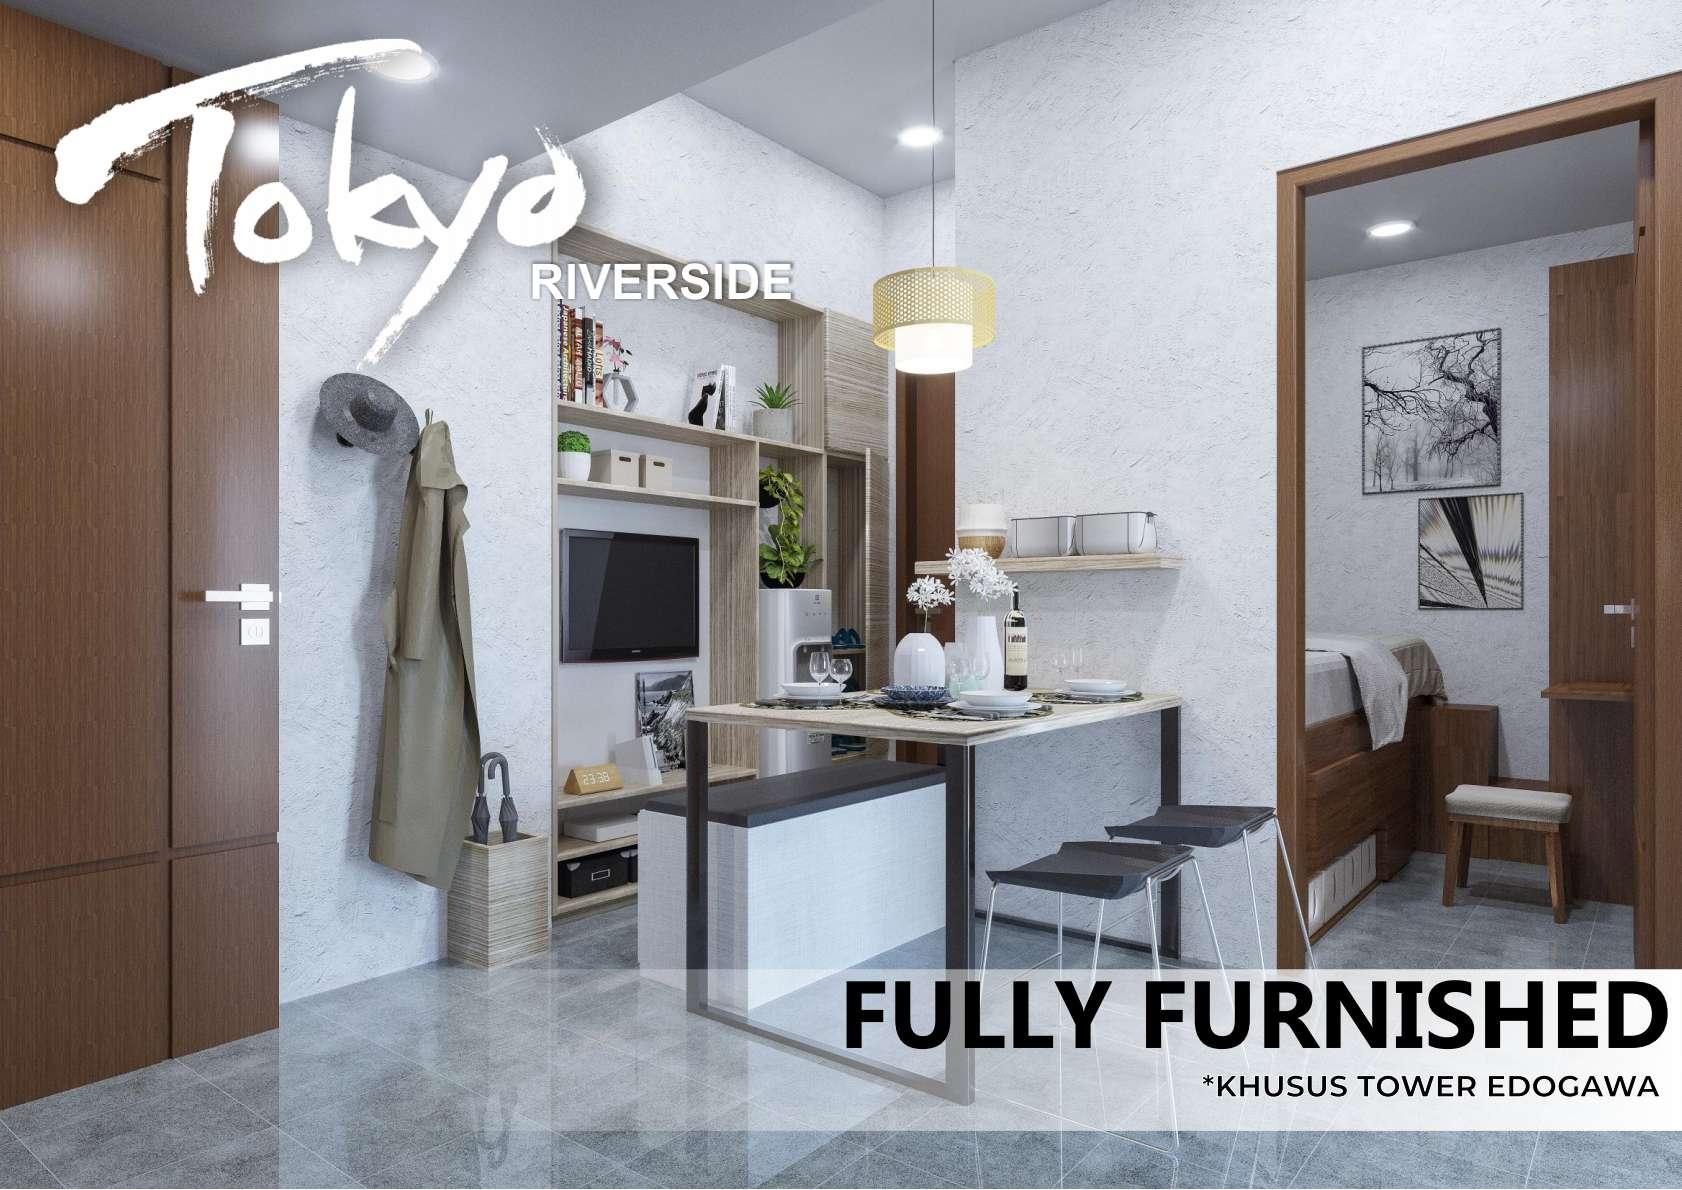 Apartment Tokyo Riverside